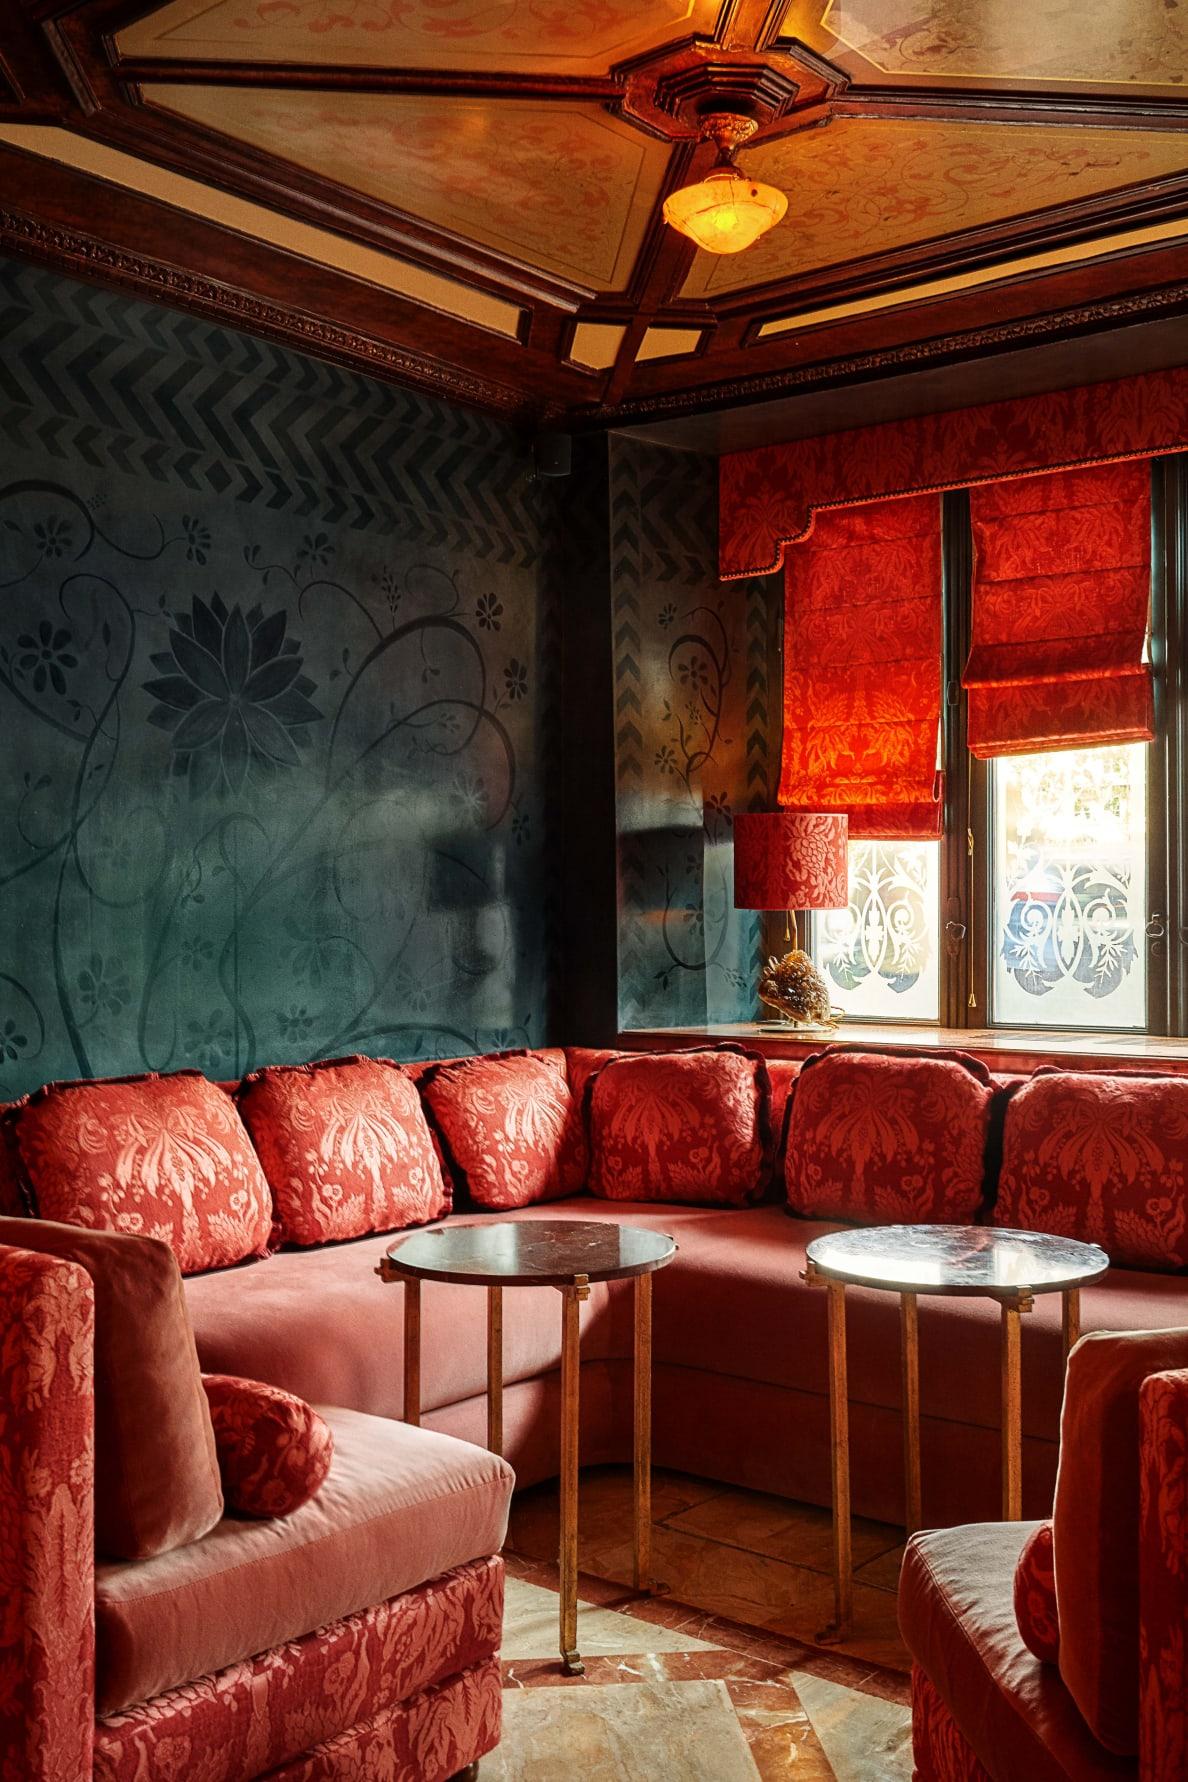 190728-Zaleski-paris-sex-restaurant-embed-5_rokgax